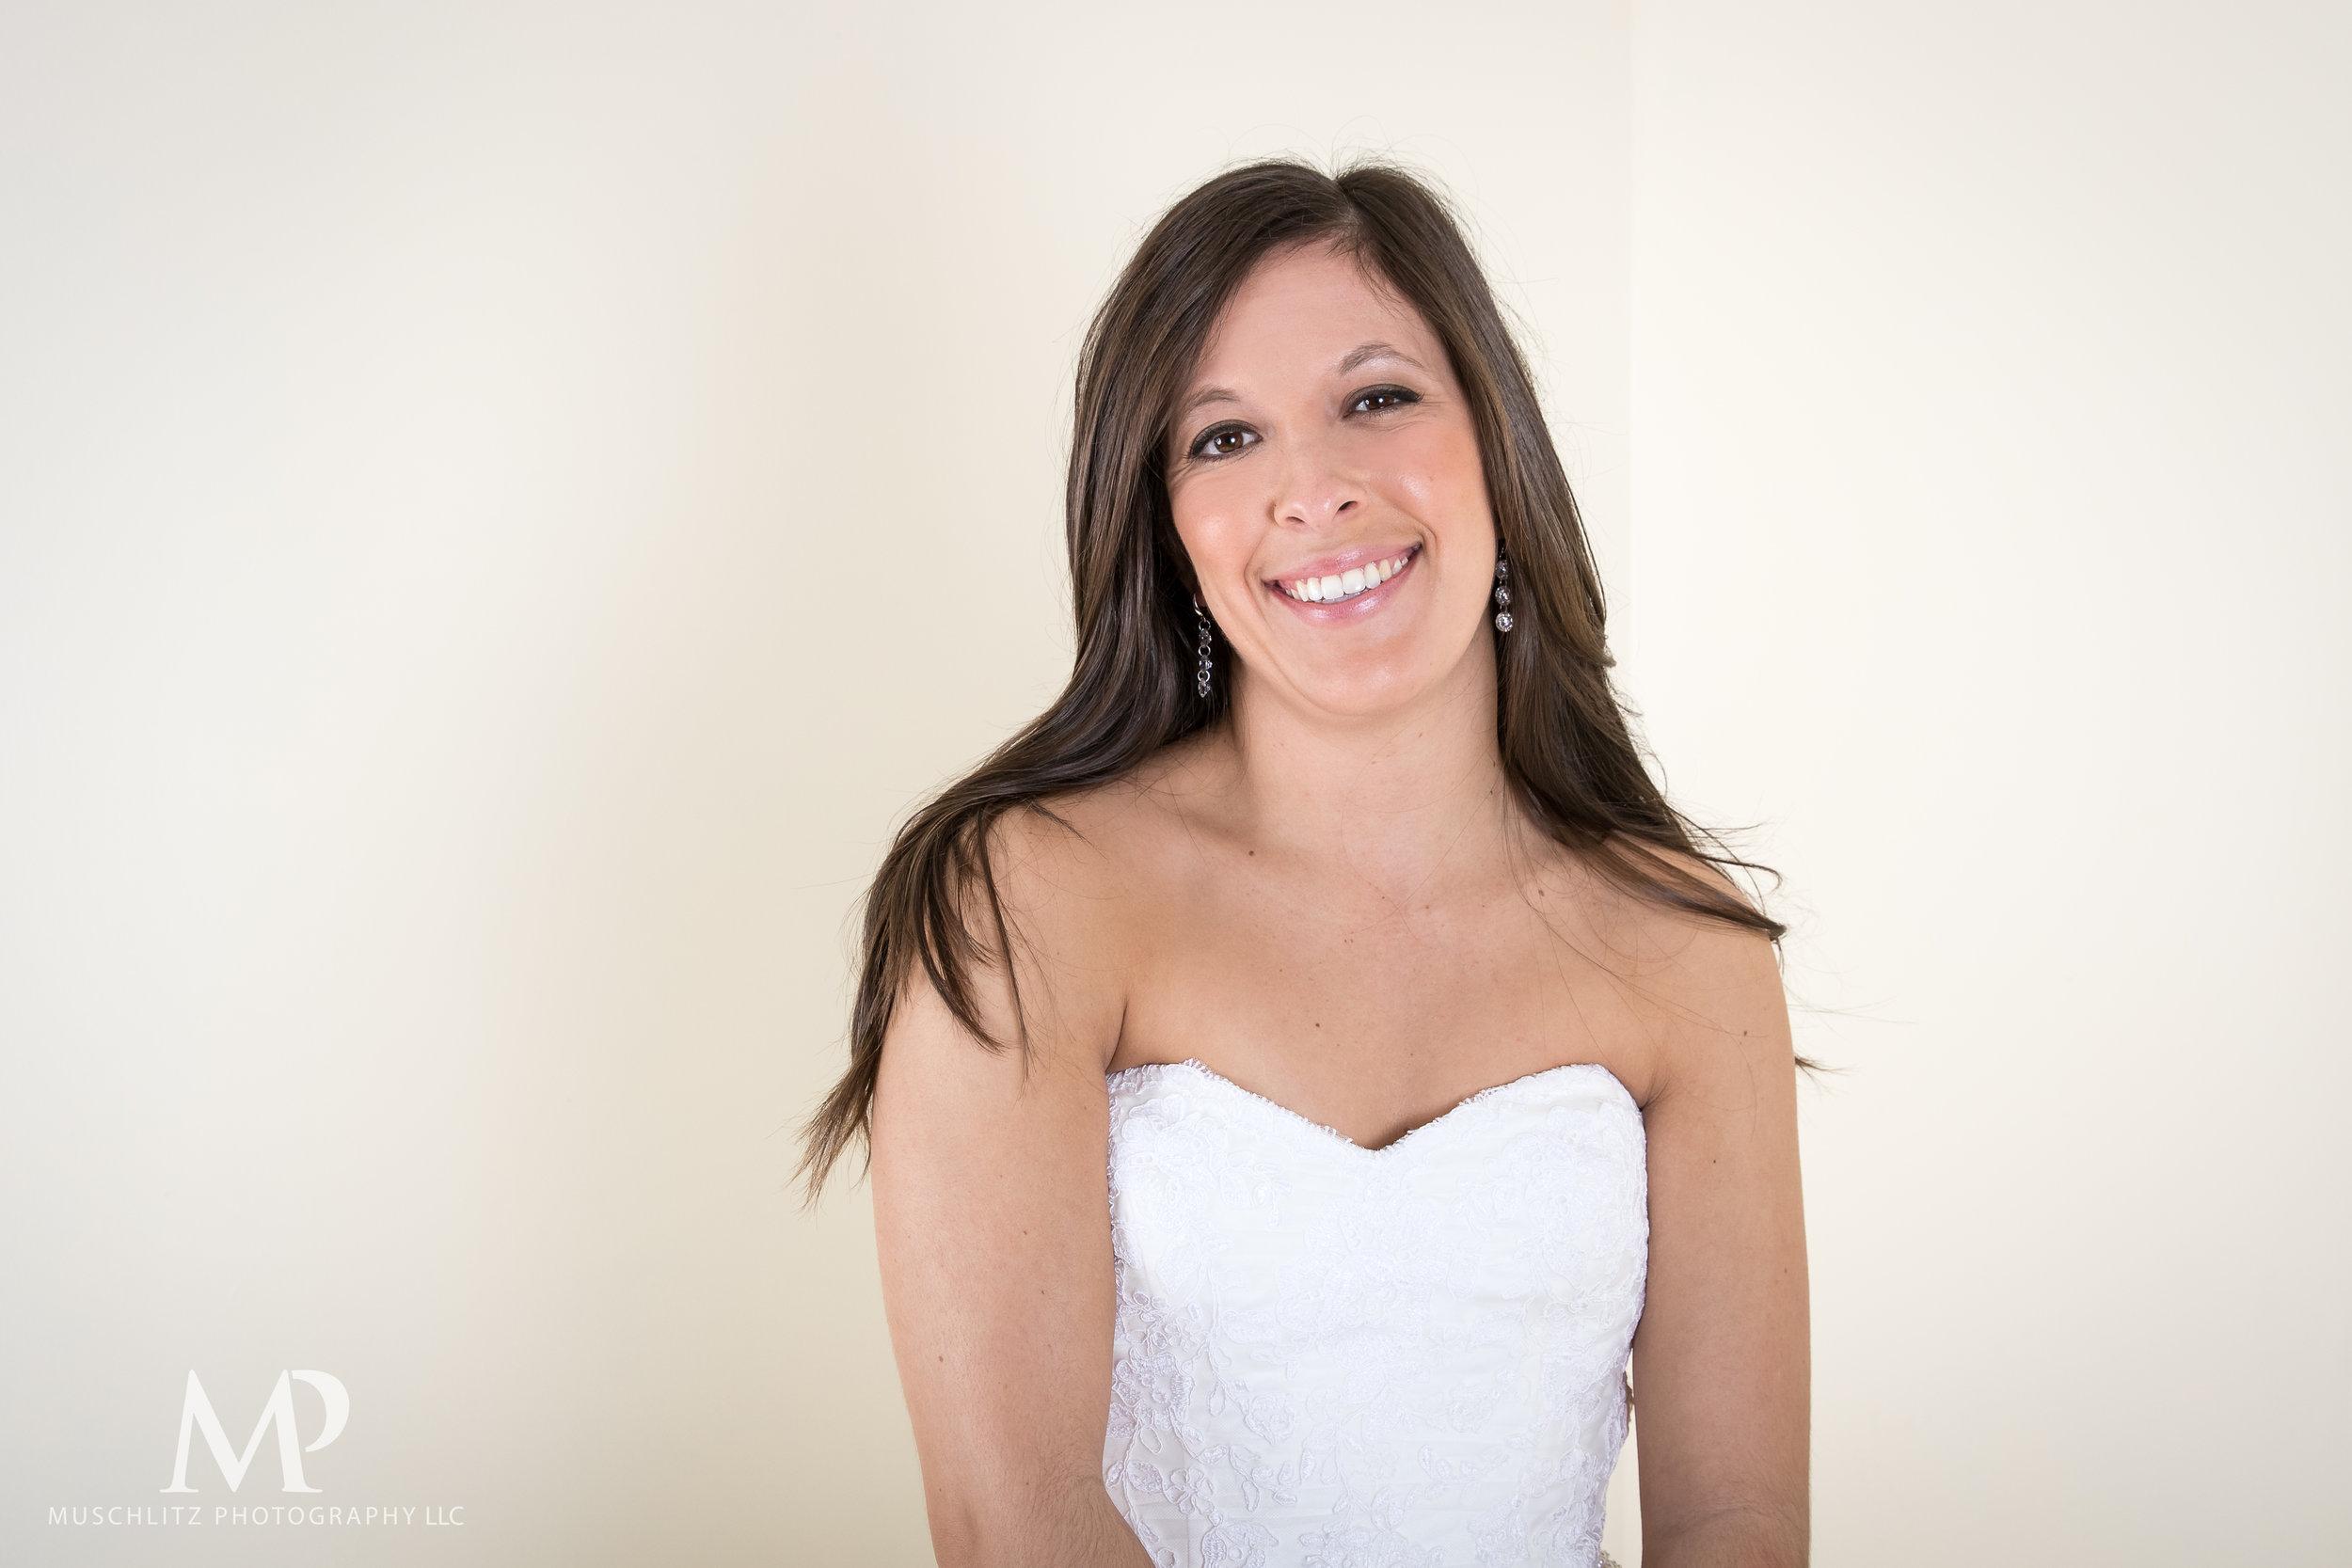 beauty-bridal-glam-the-dress-portraits-photographer-studio-columbus-ohio-gahanna-muschlitz-photography-019.JPG